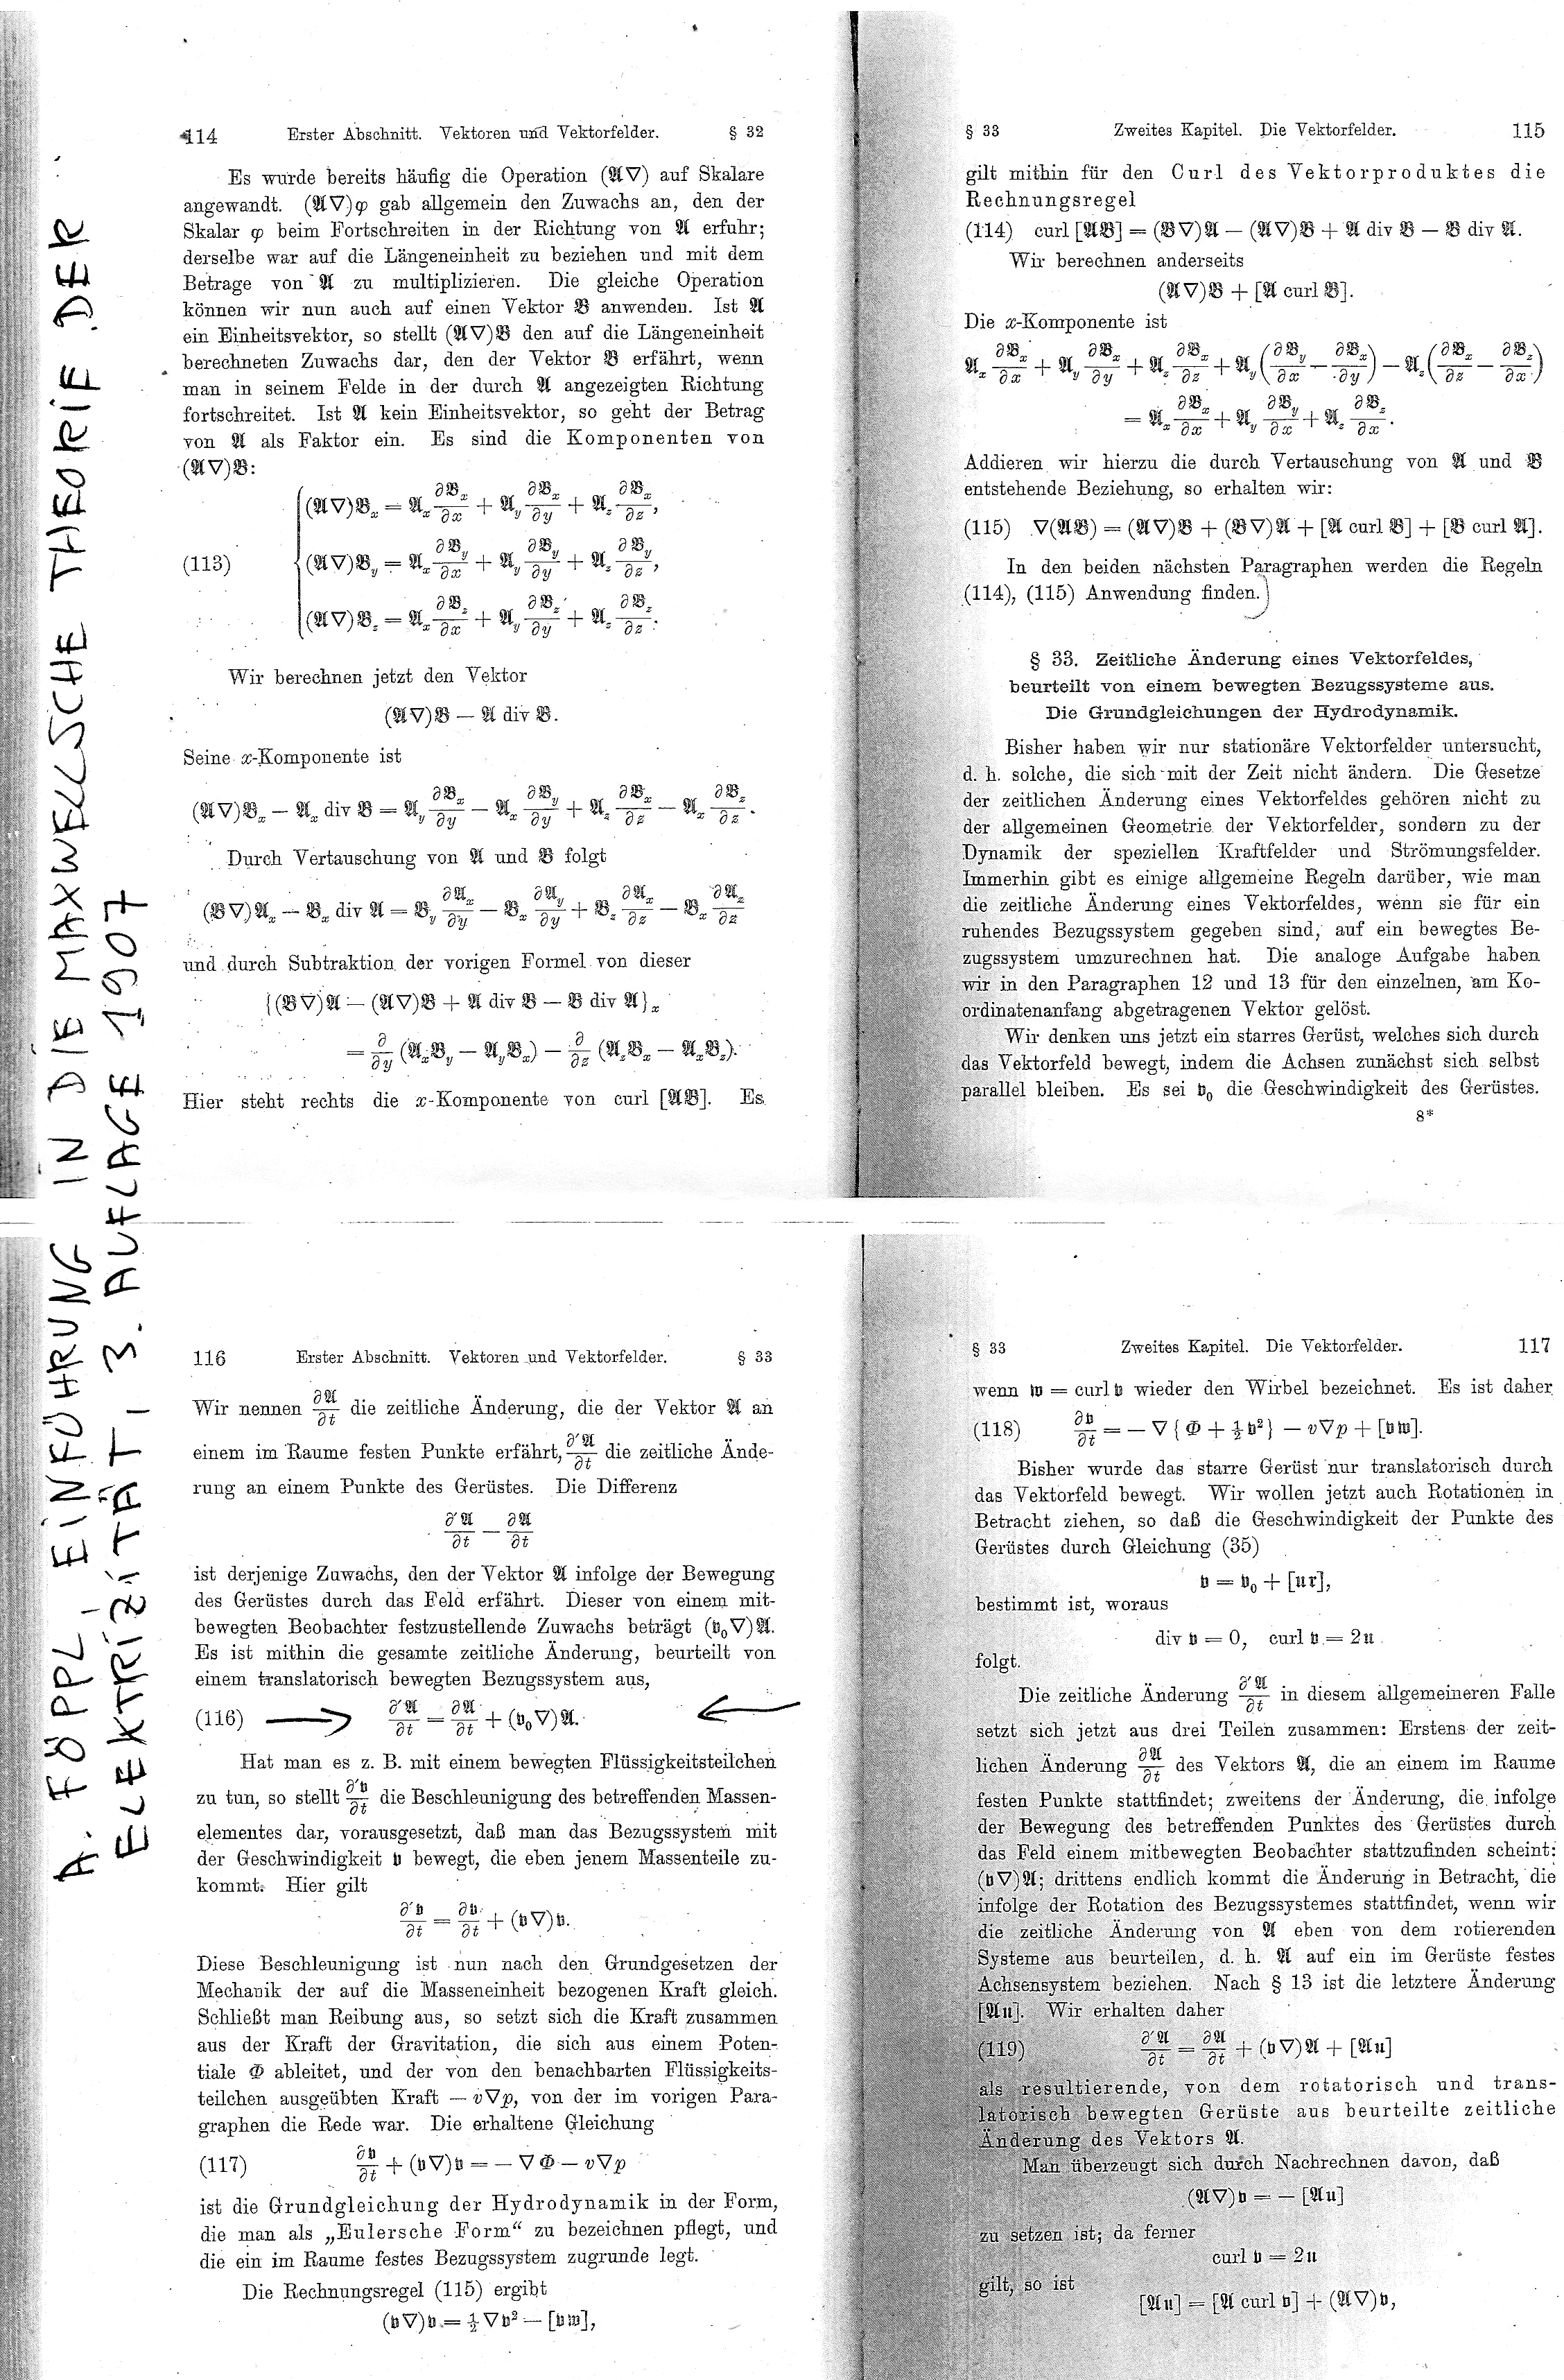 jackson klassische elektrodynamik pdf